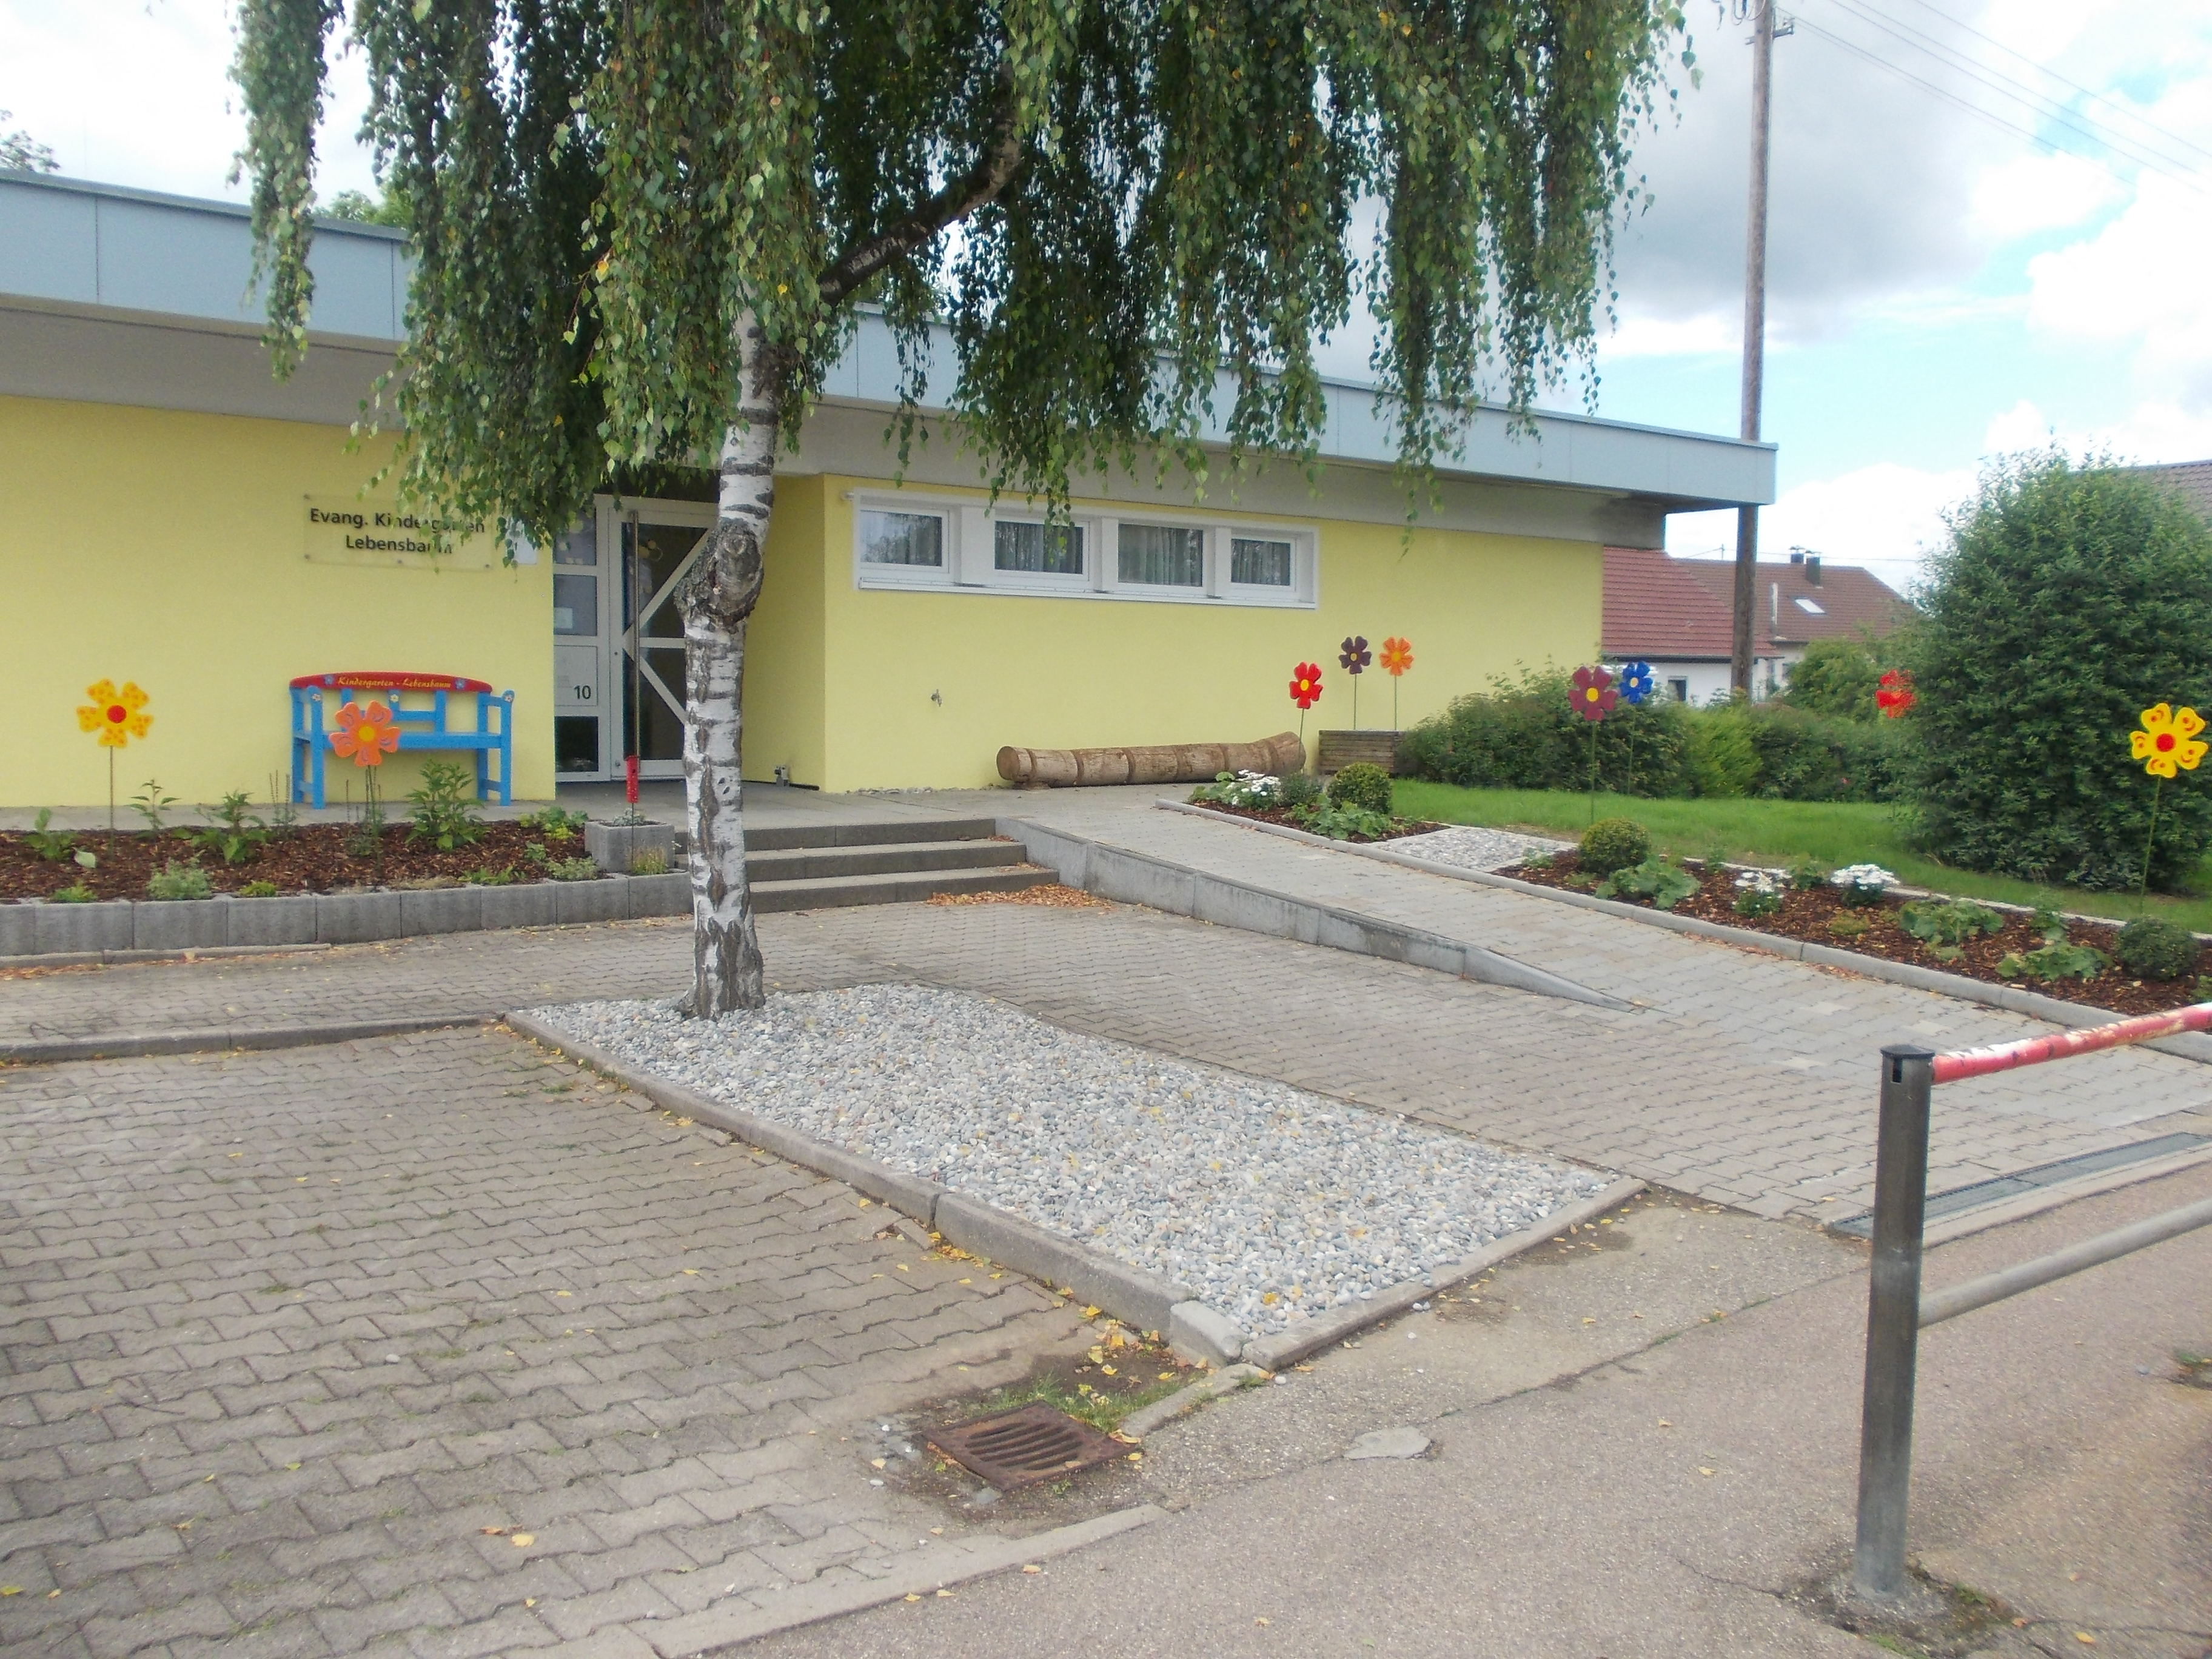 Evangelischer kindergarten lebensbaum in fachsenfeld for Evangelischer kindergarten